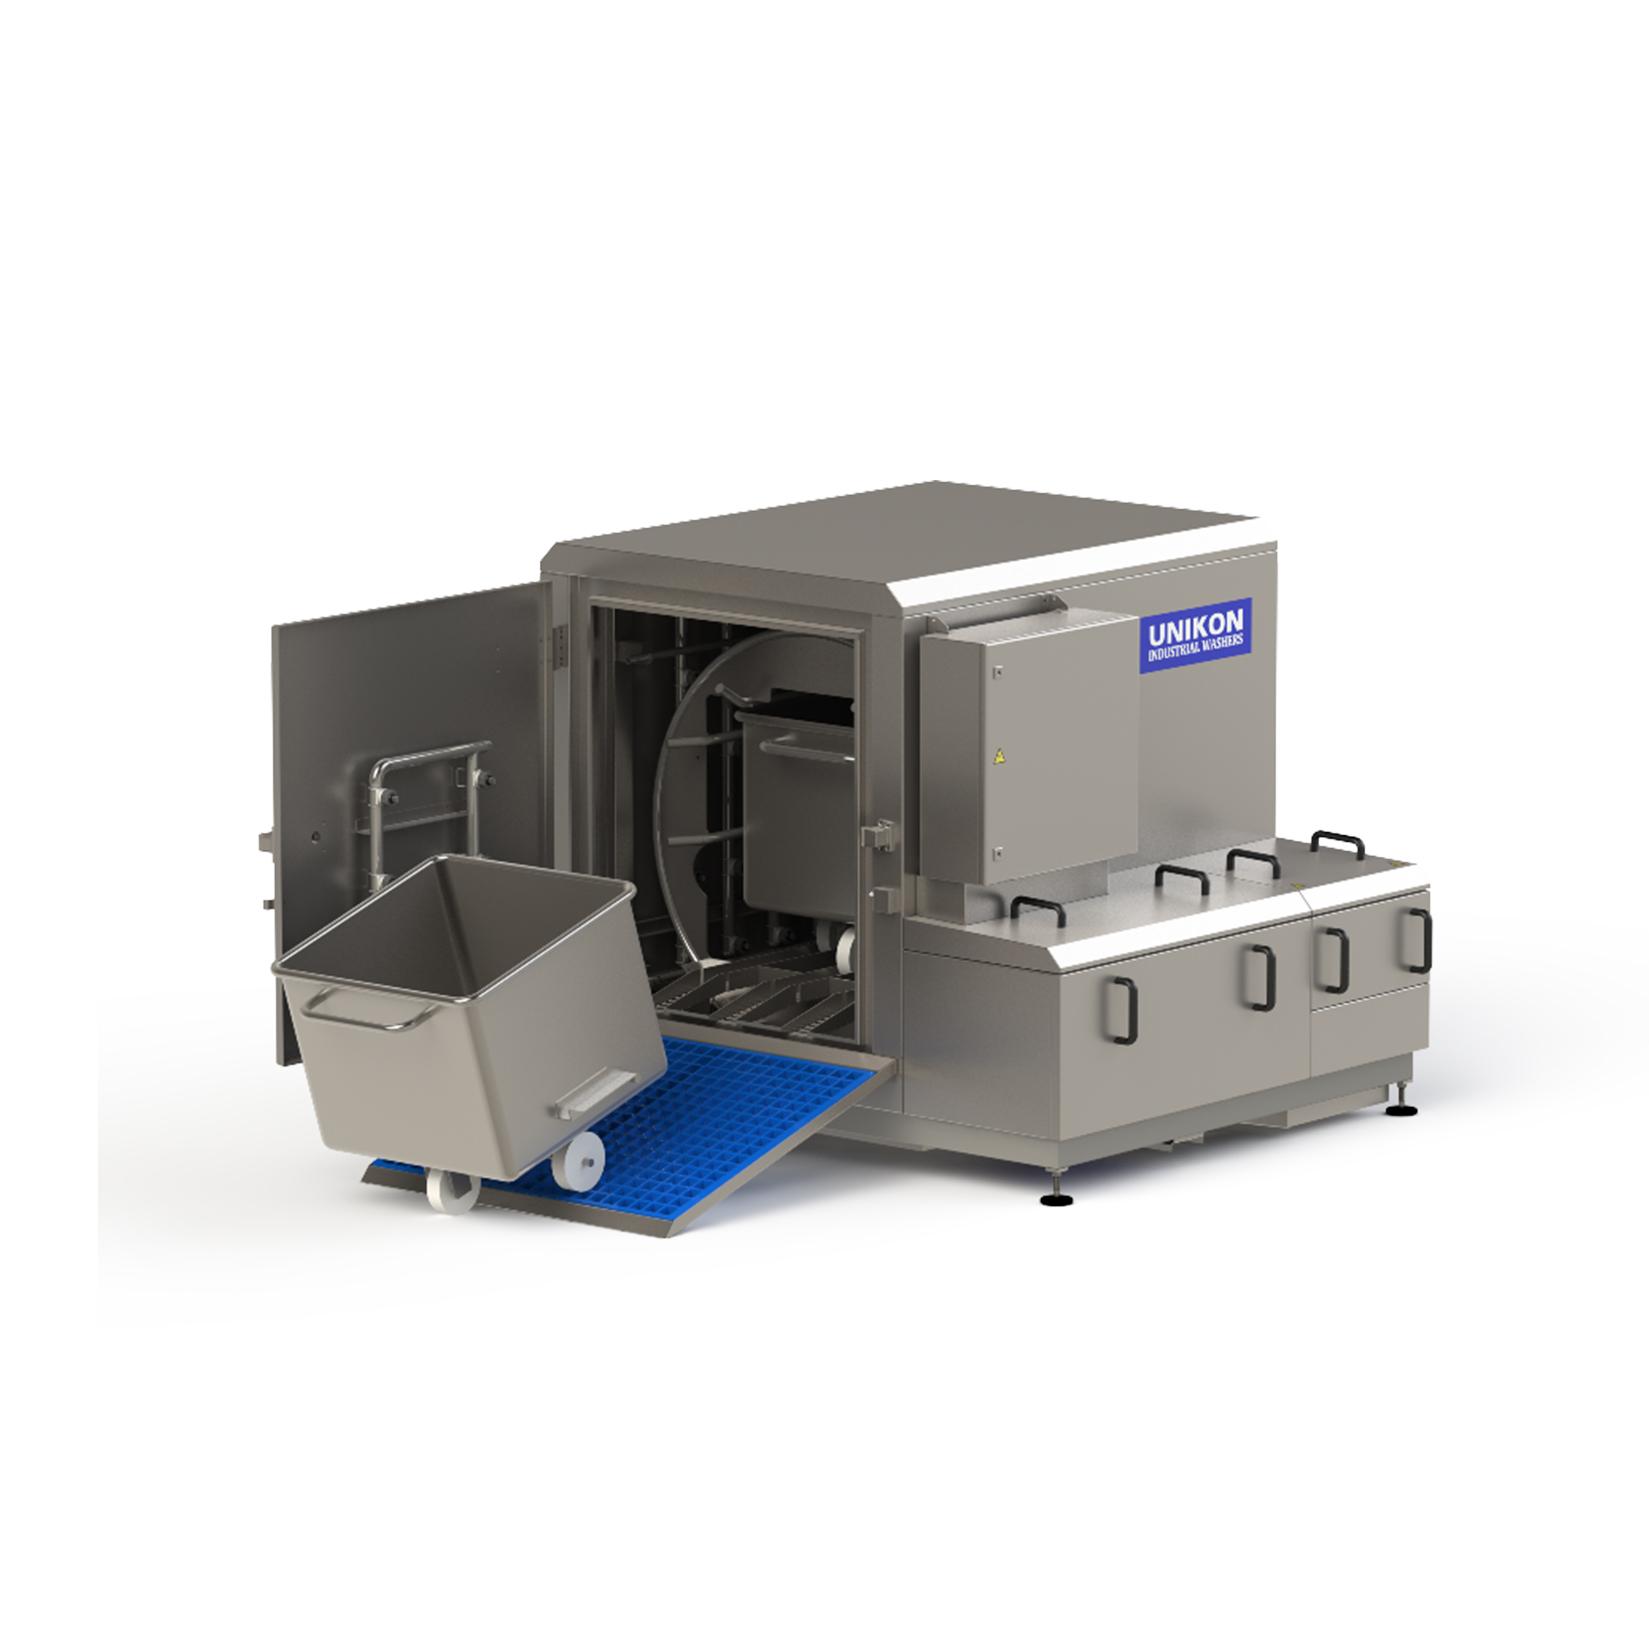 Bin/container washer – Unikon